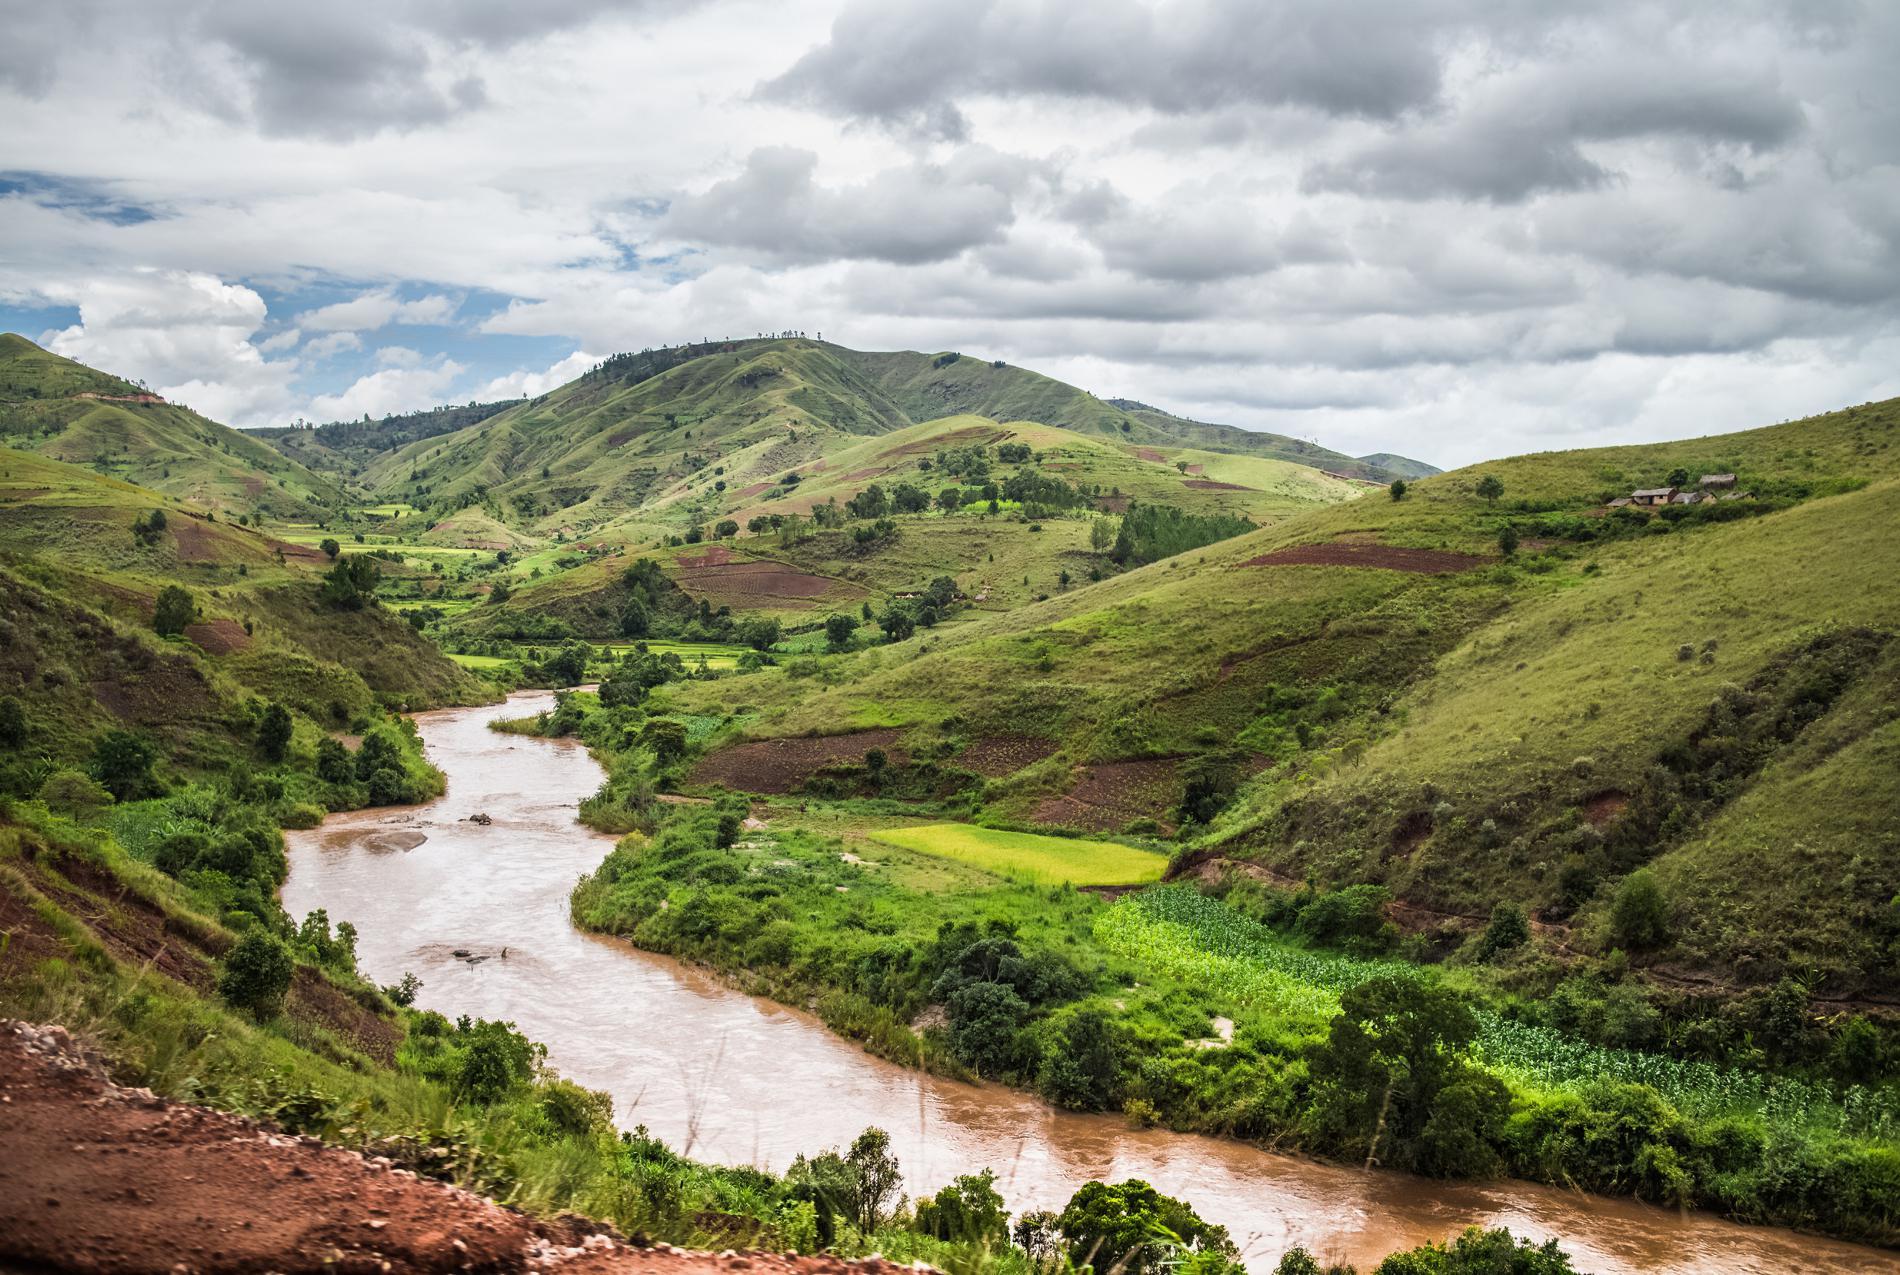 Voyage solidaire Madagascar : Vision du Monde - Photo 2